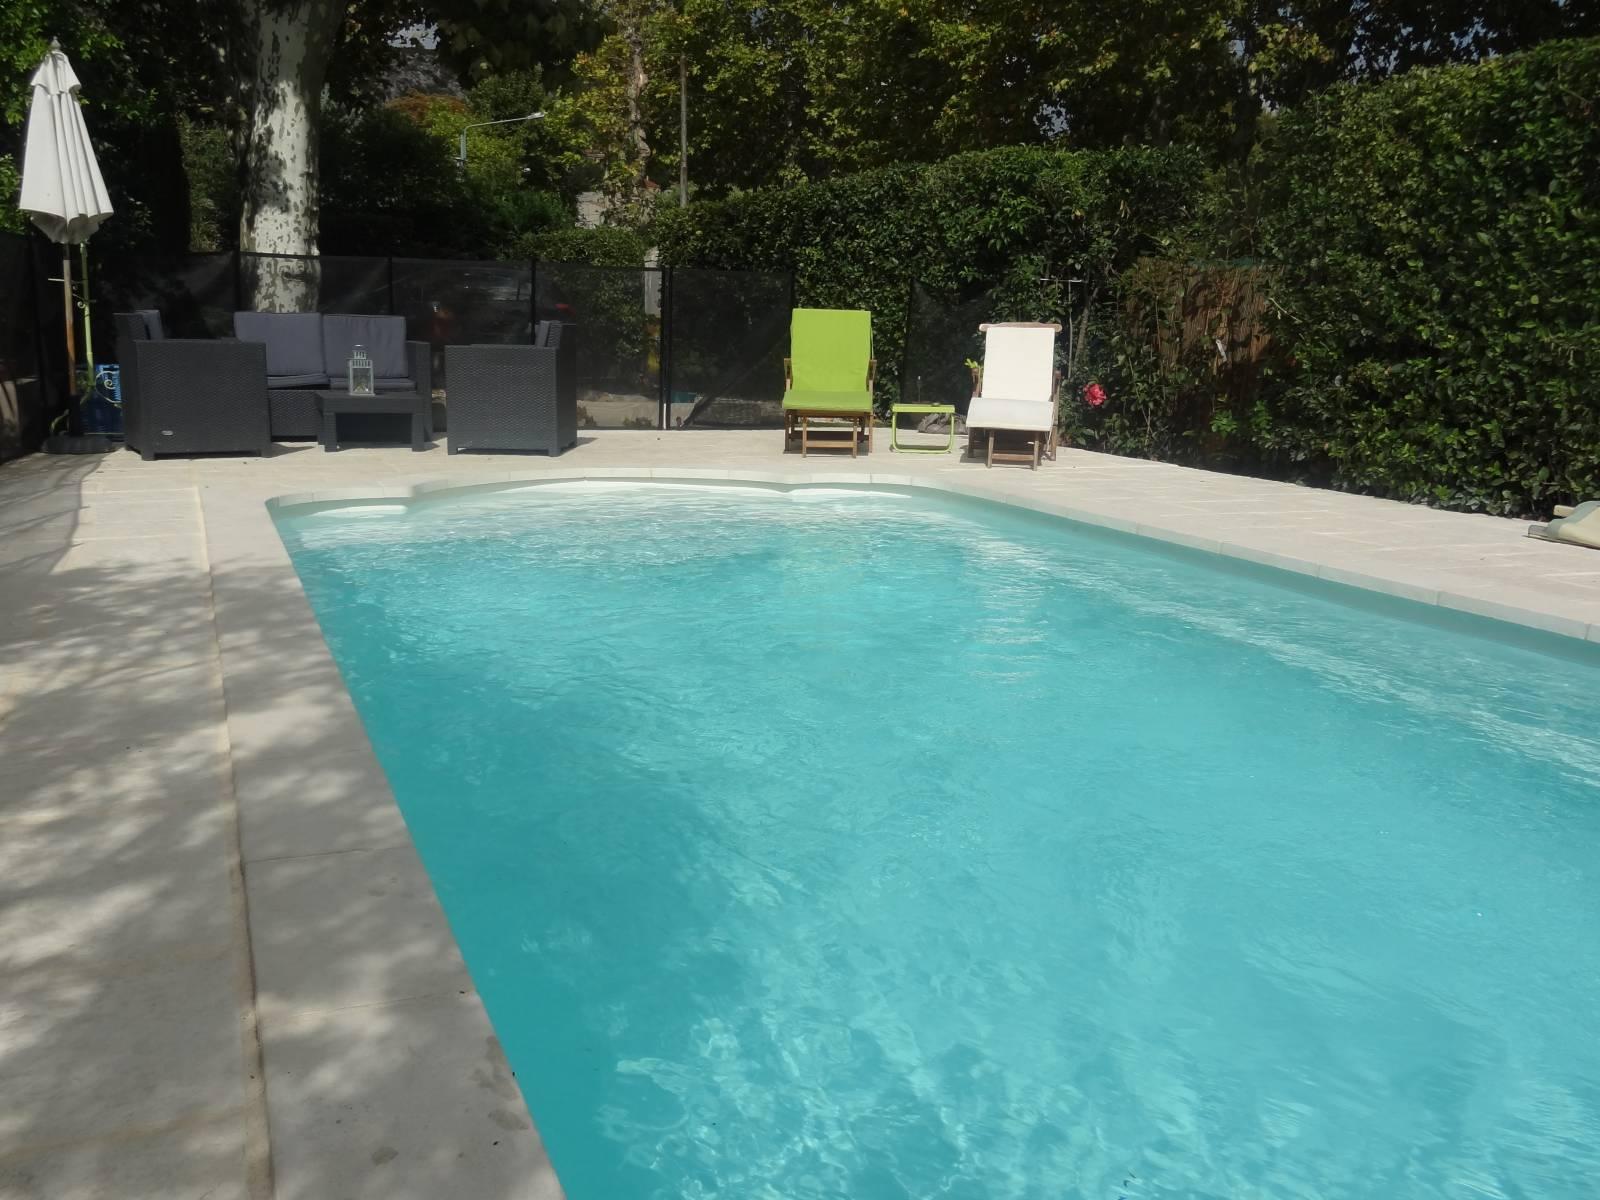 Piscine coque polyester avec escalier roman et banquette for Coque polyester piscine